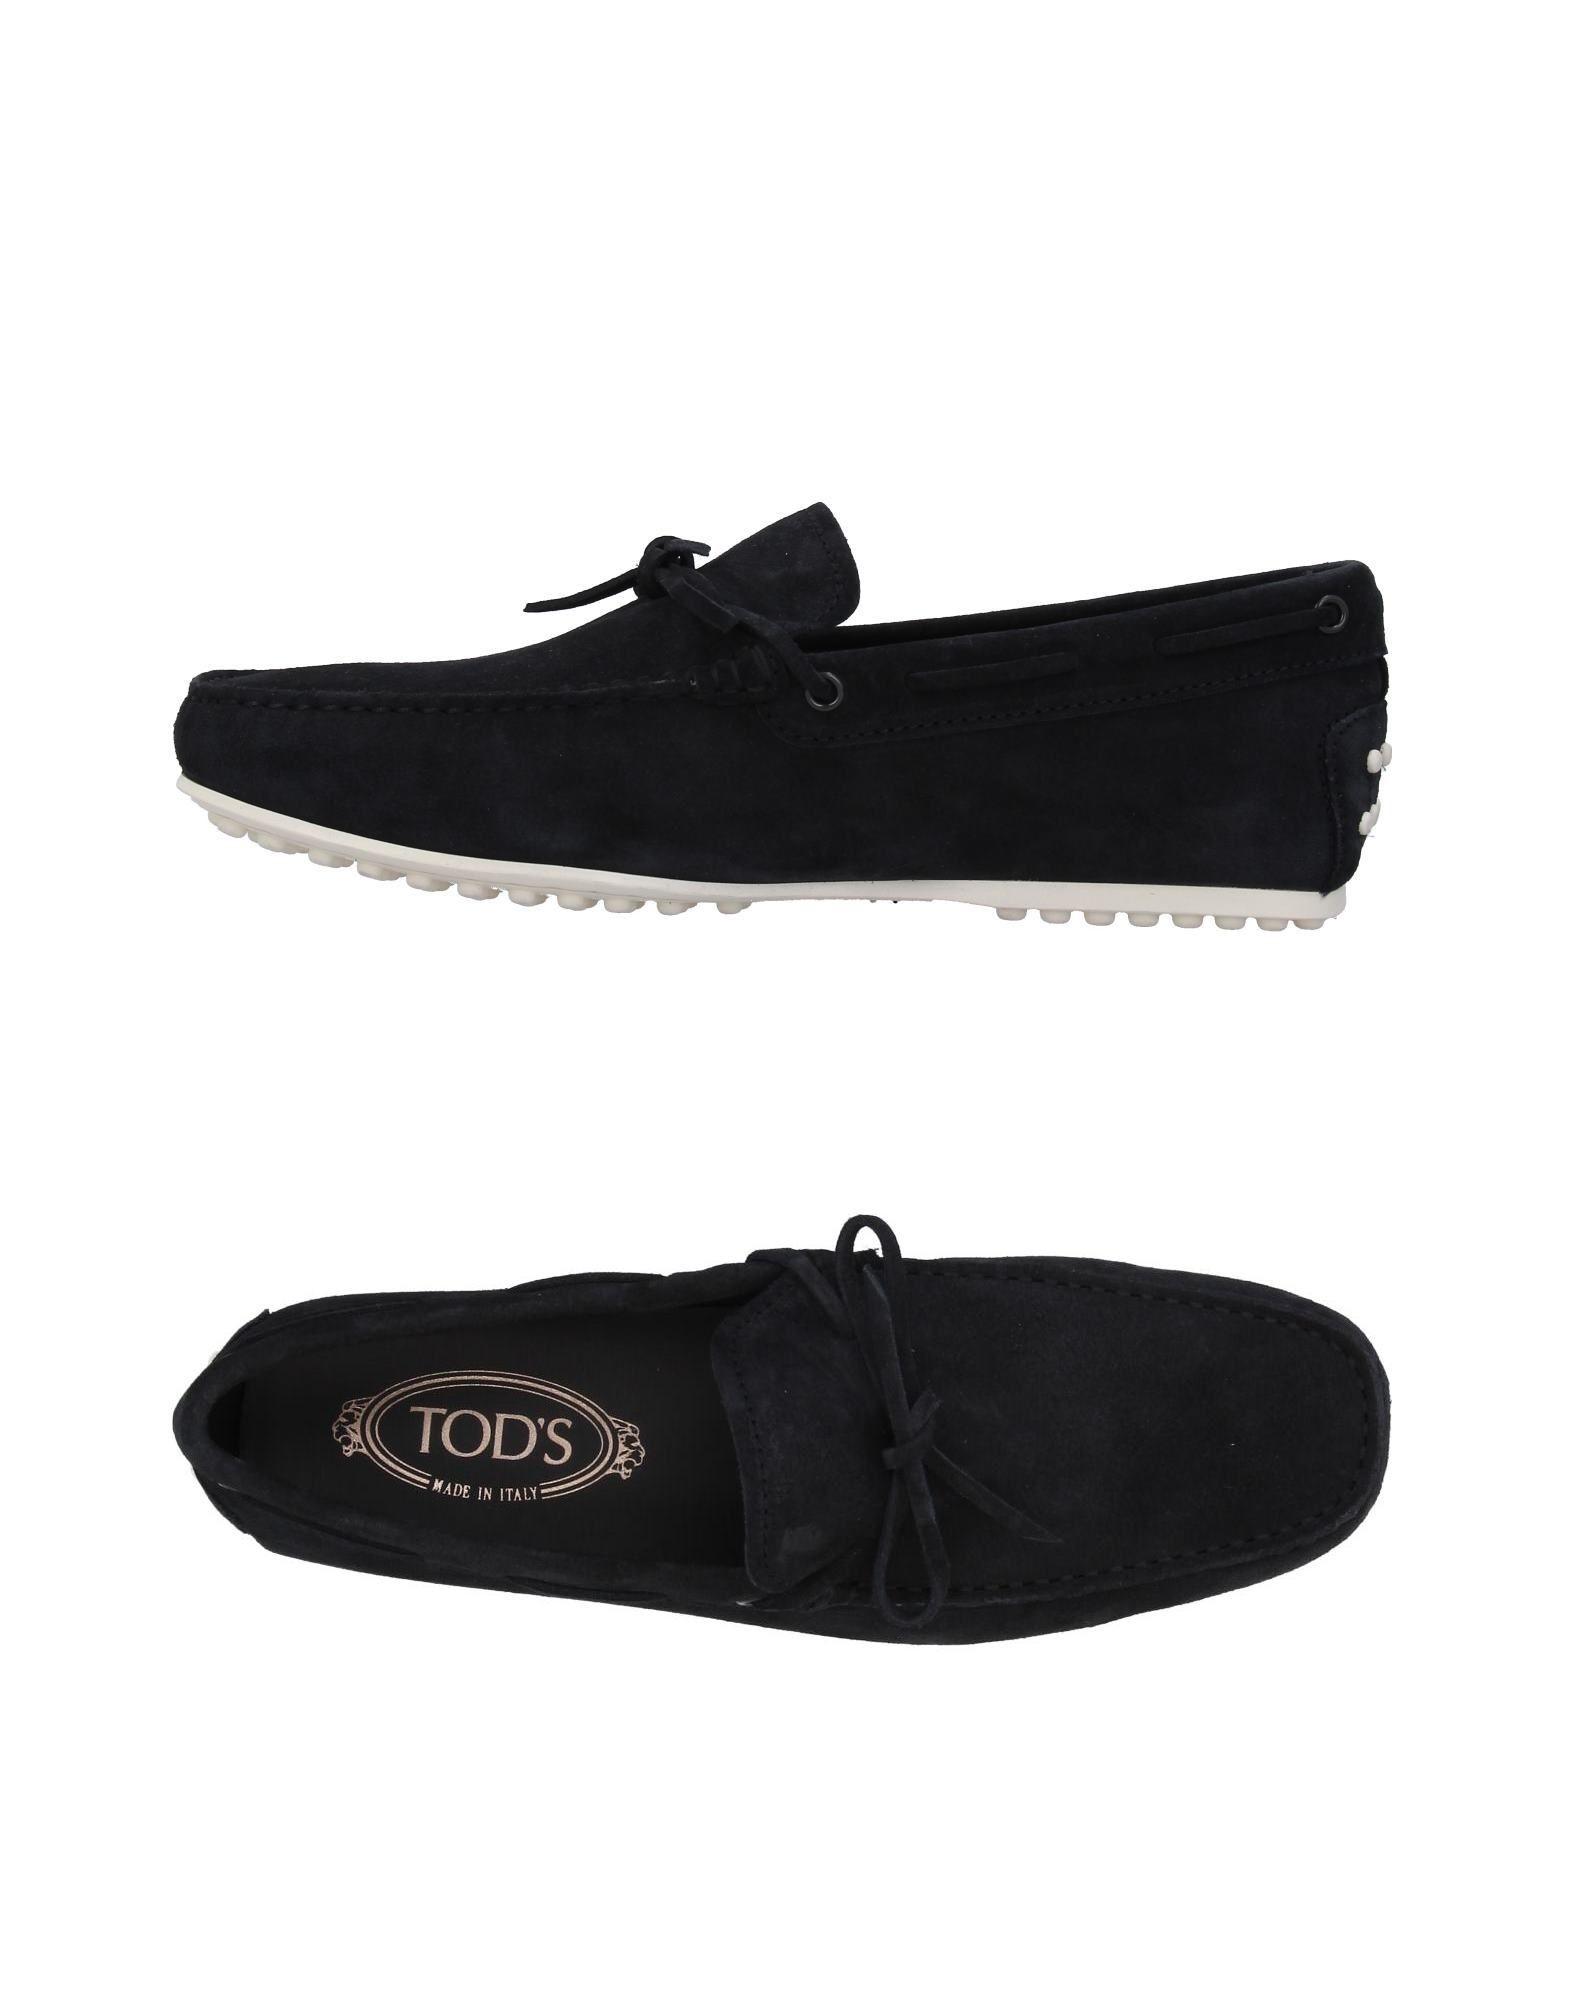 Tod's Mokassins Herren  11332333VS Gute Qualität beliebte Schuhe